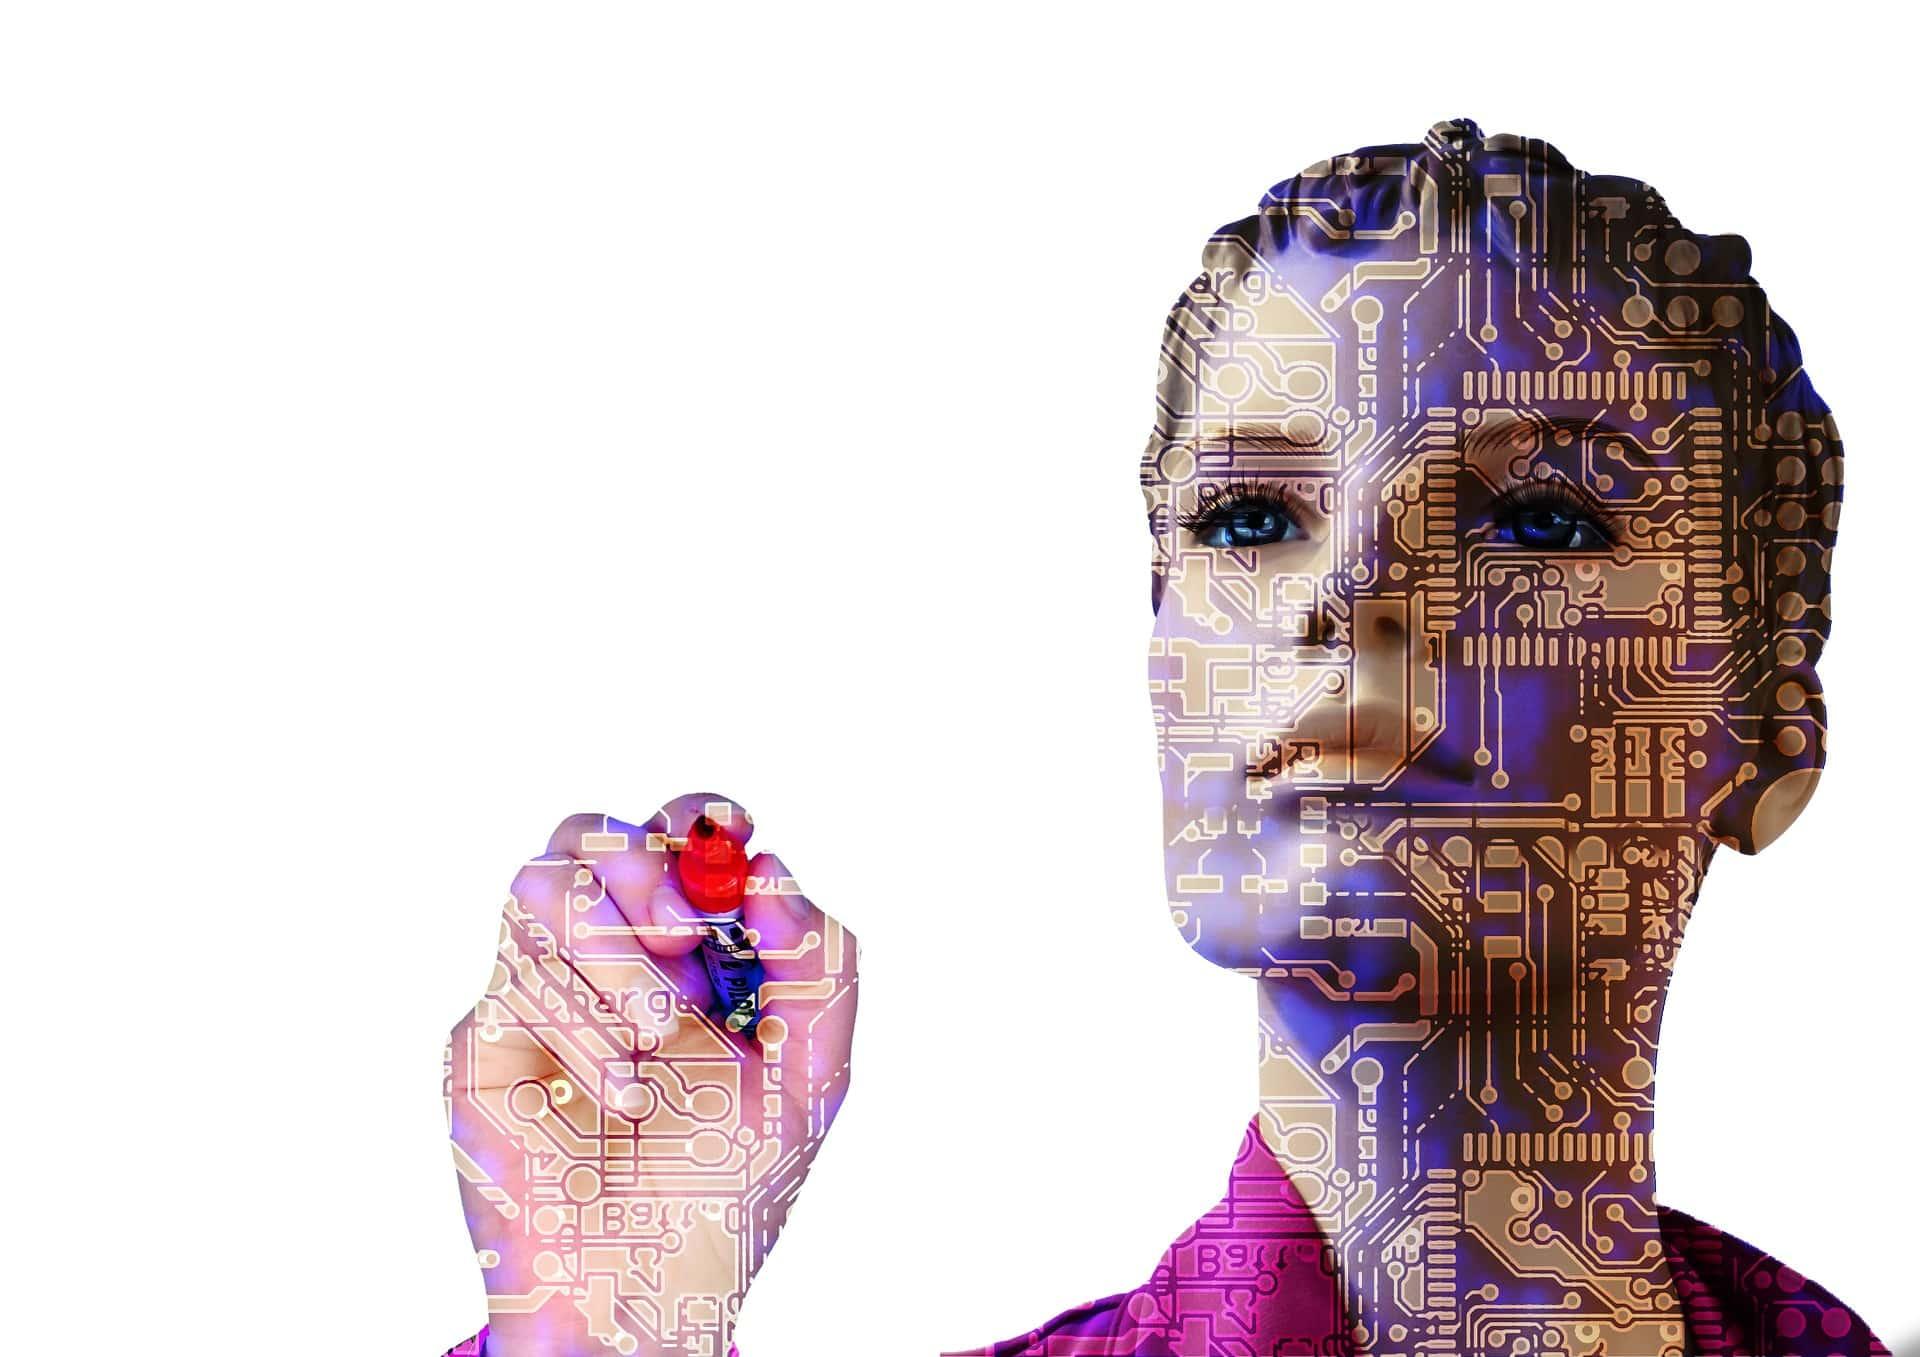 MindWriting, il programma che traduce i pensieri in parole digitali